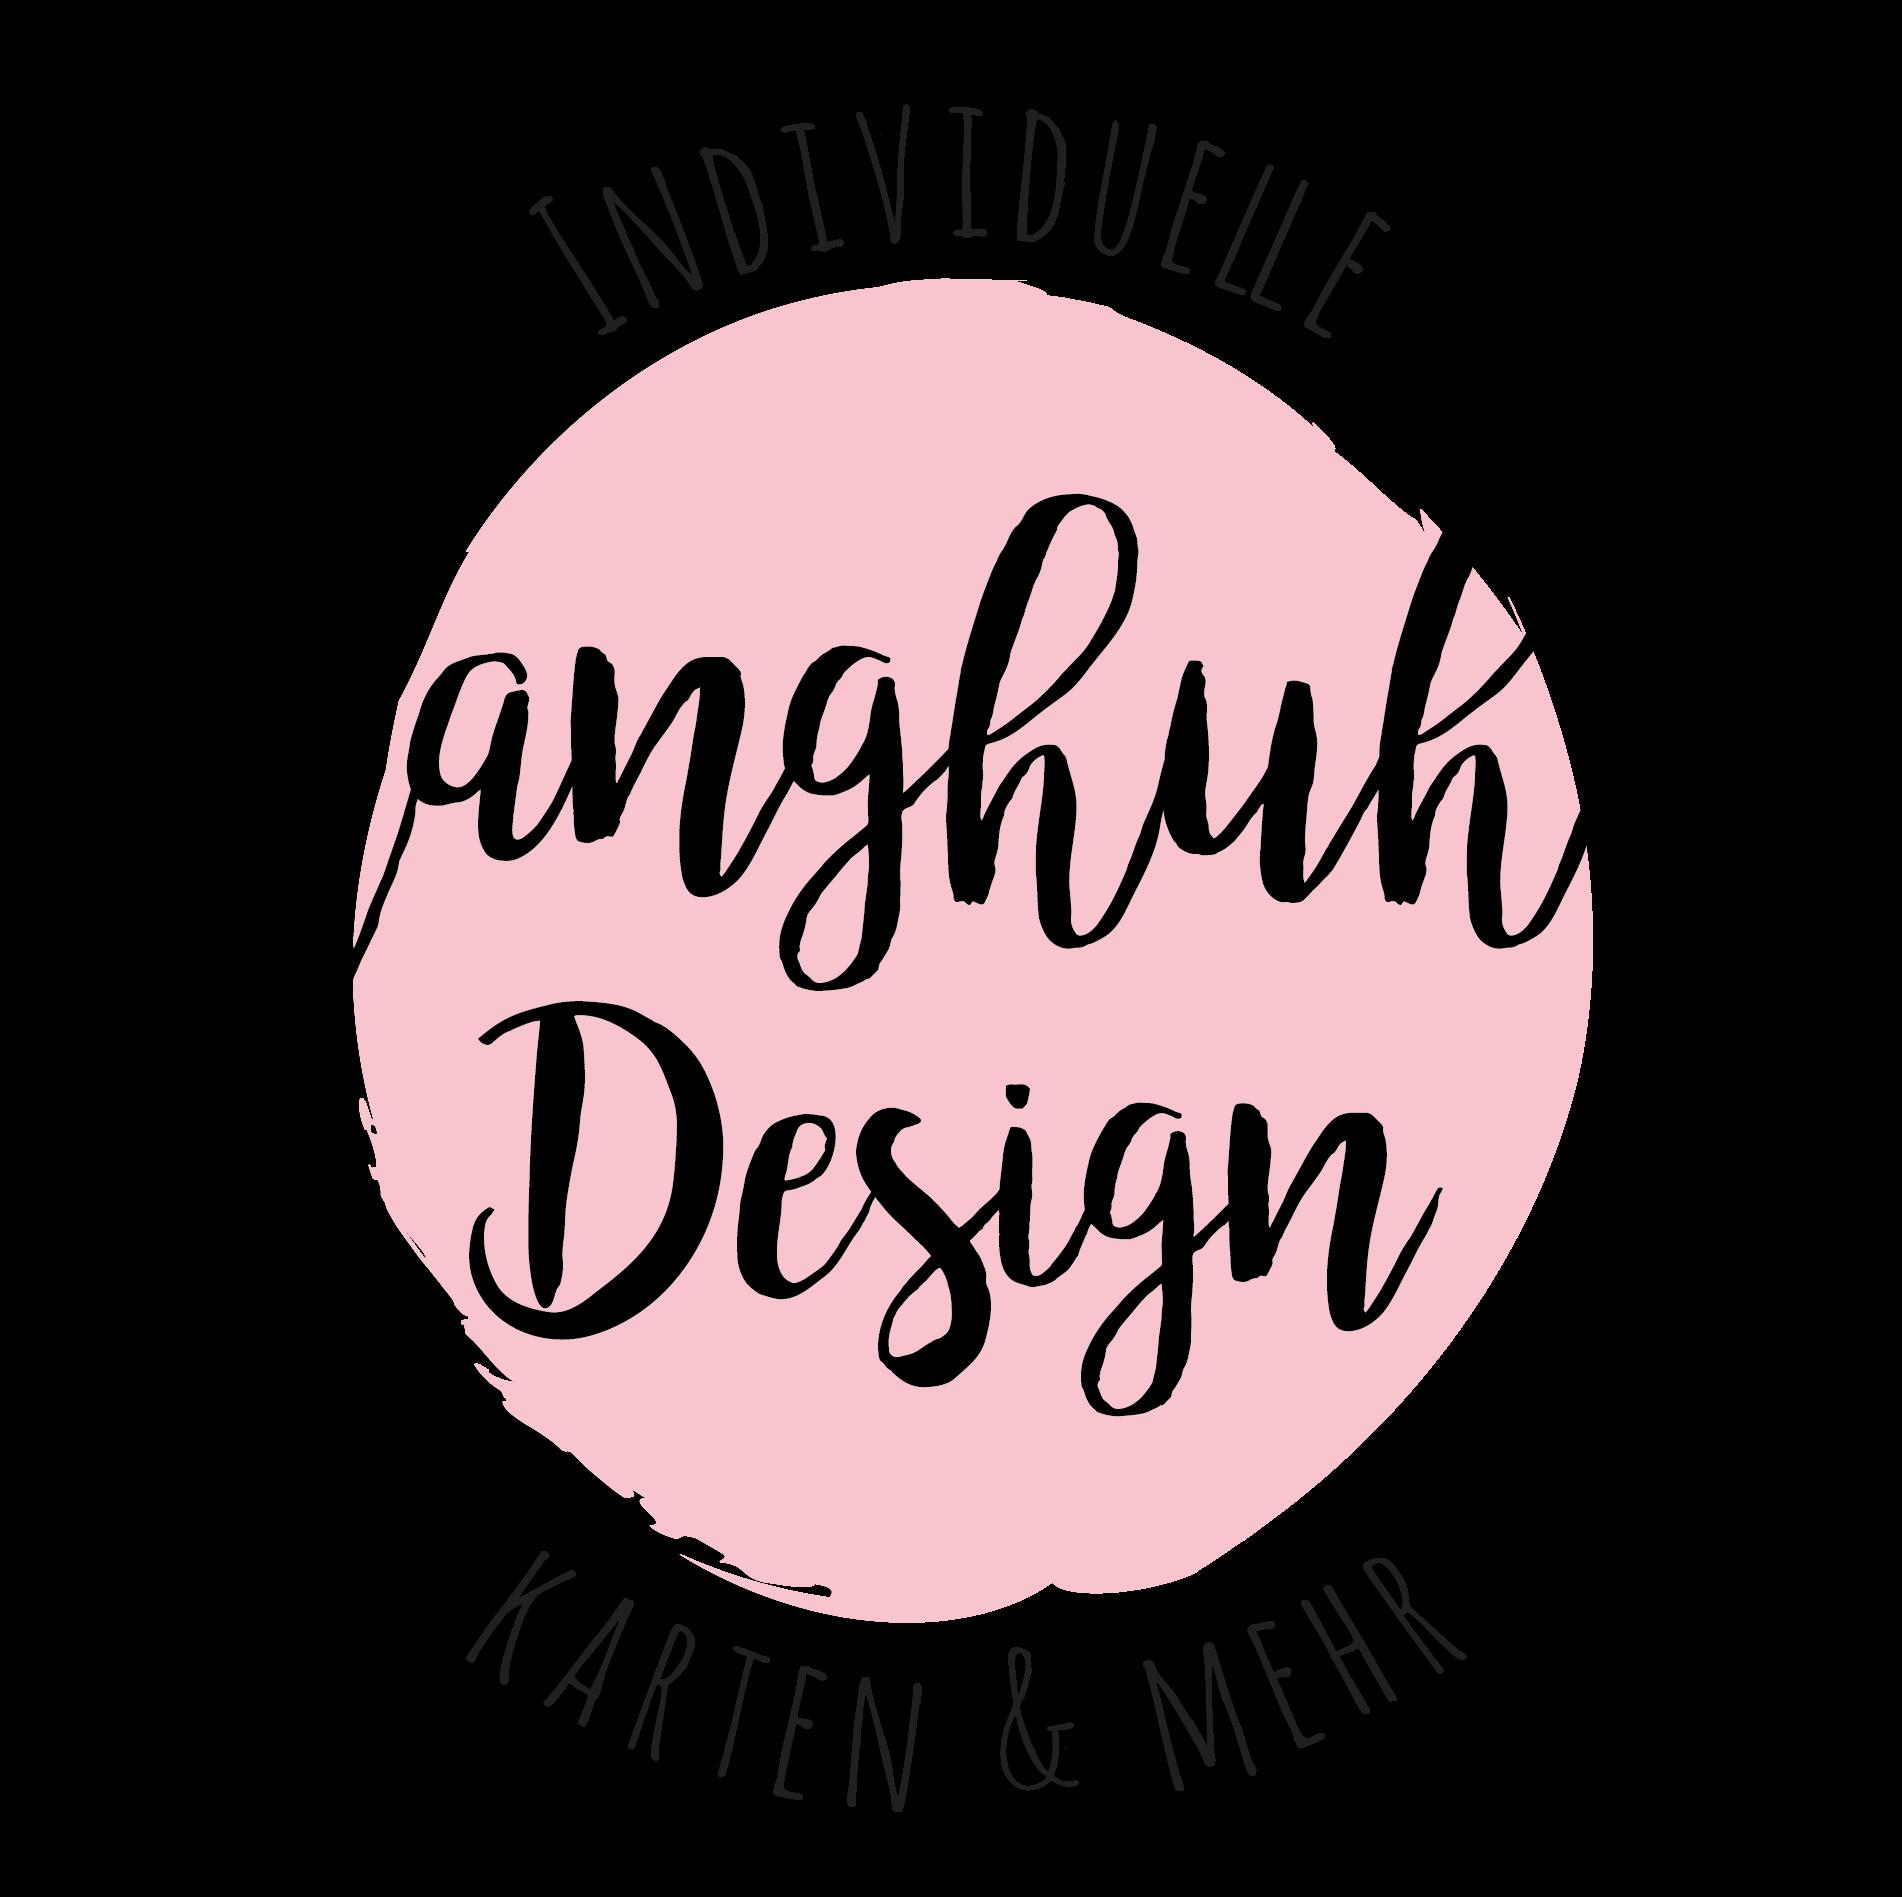 Hanghuhn Design